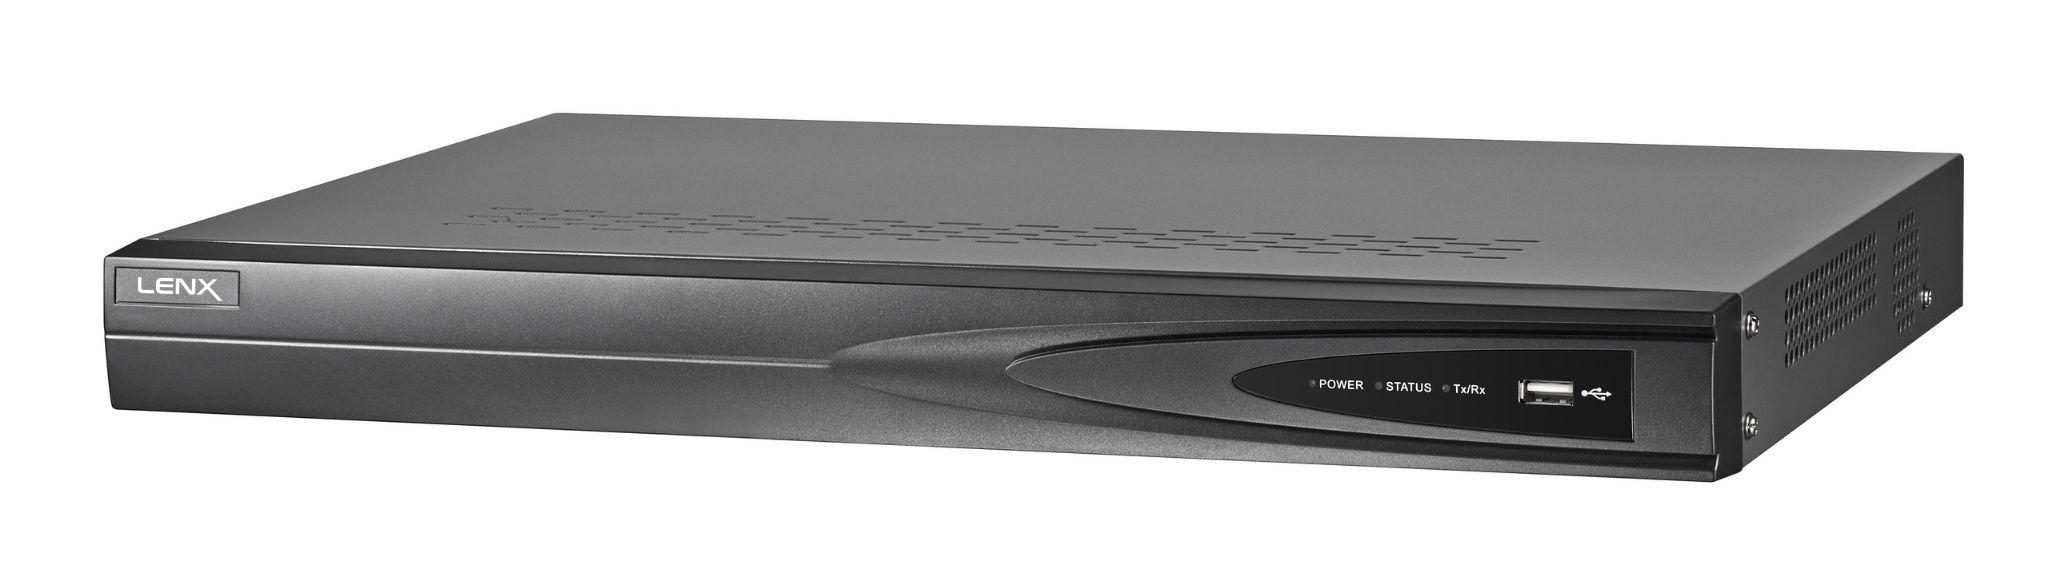 LX-N-208/1